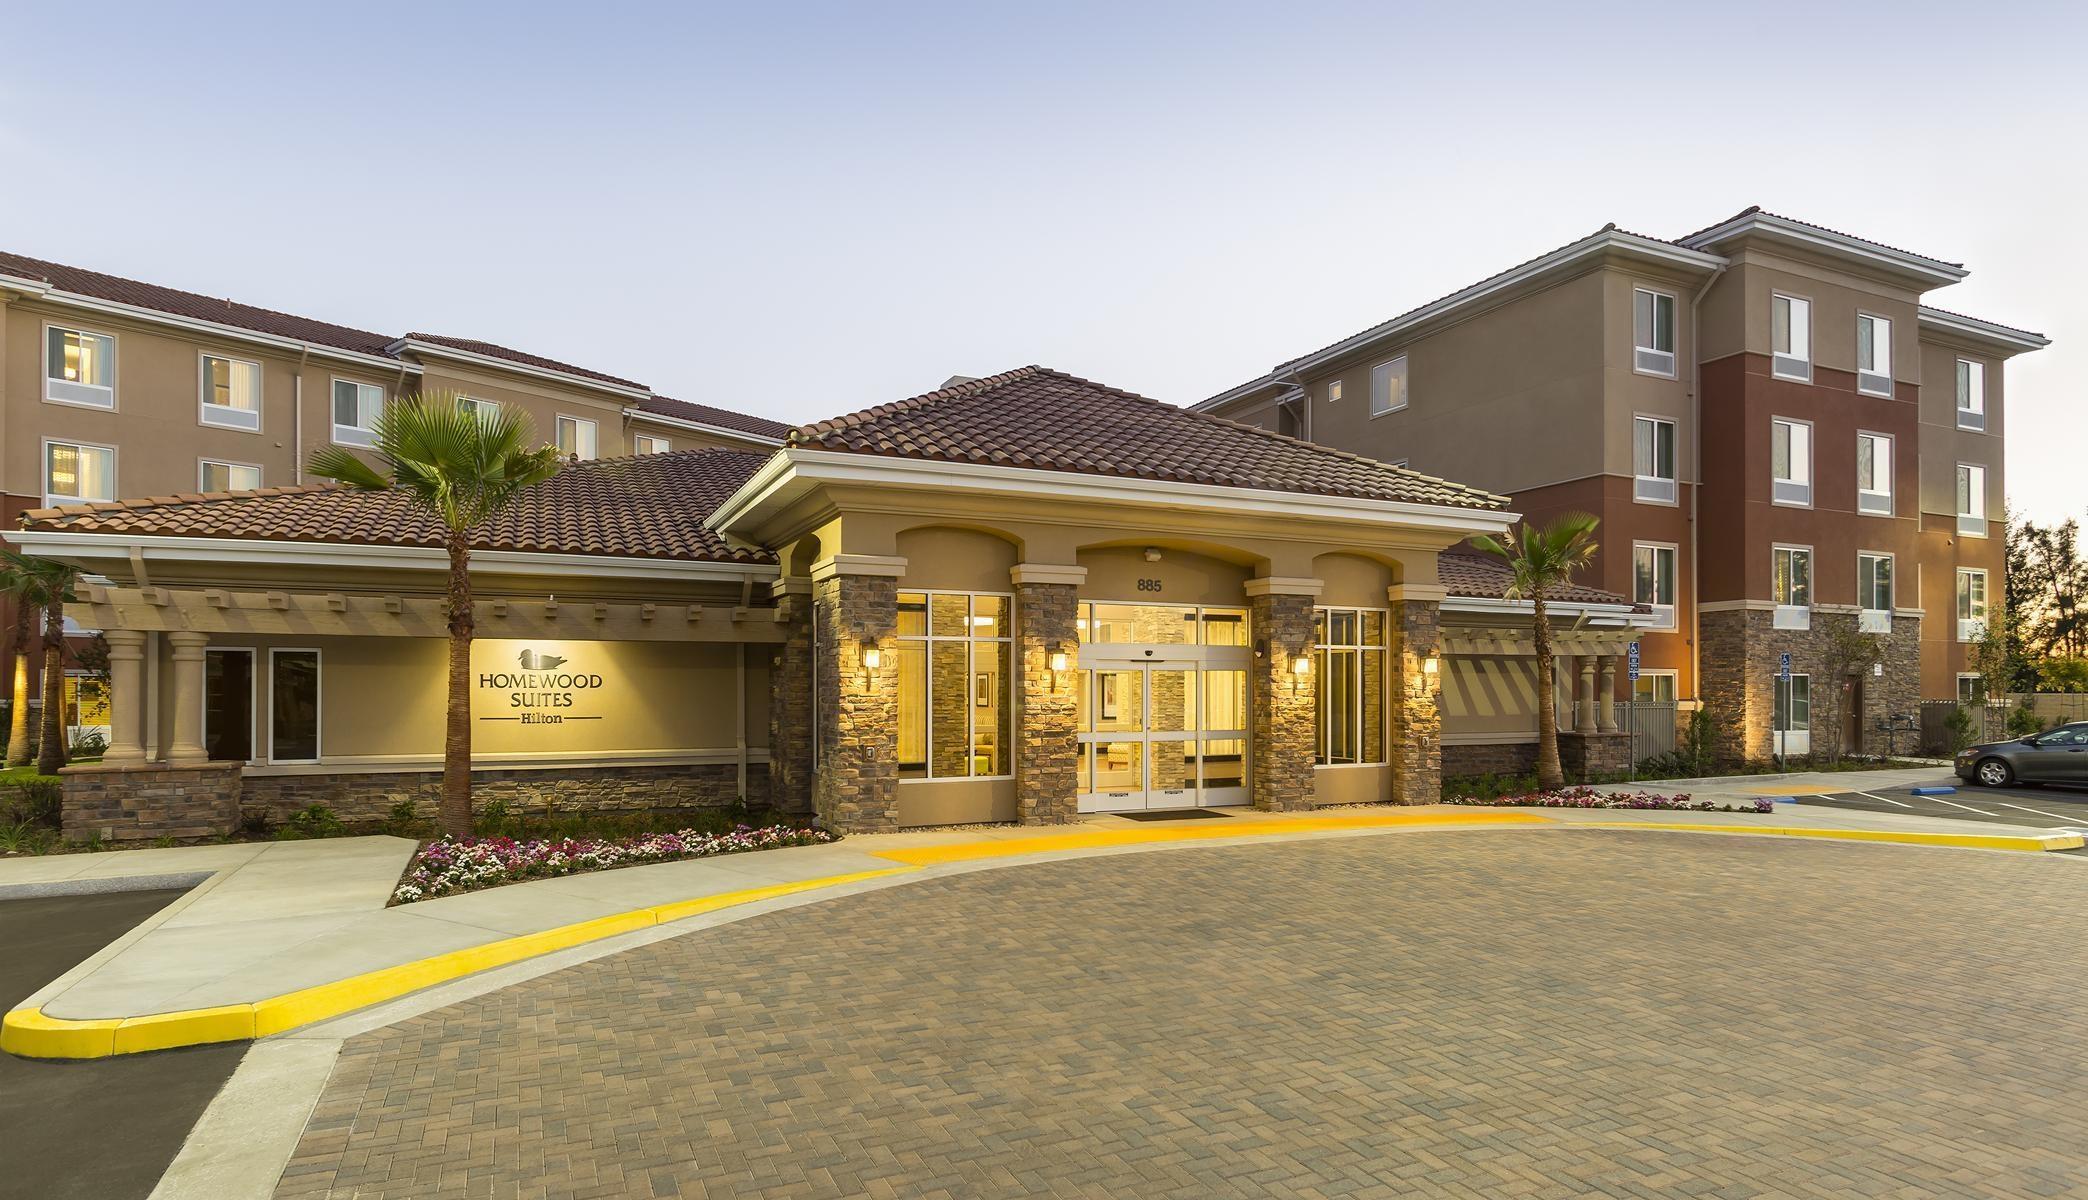 Homewood Suites by Hilton San Bernardino at 885 East Hospitality ...